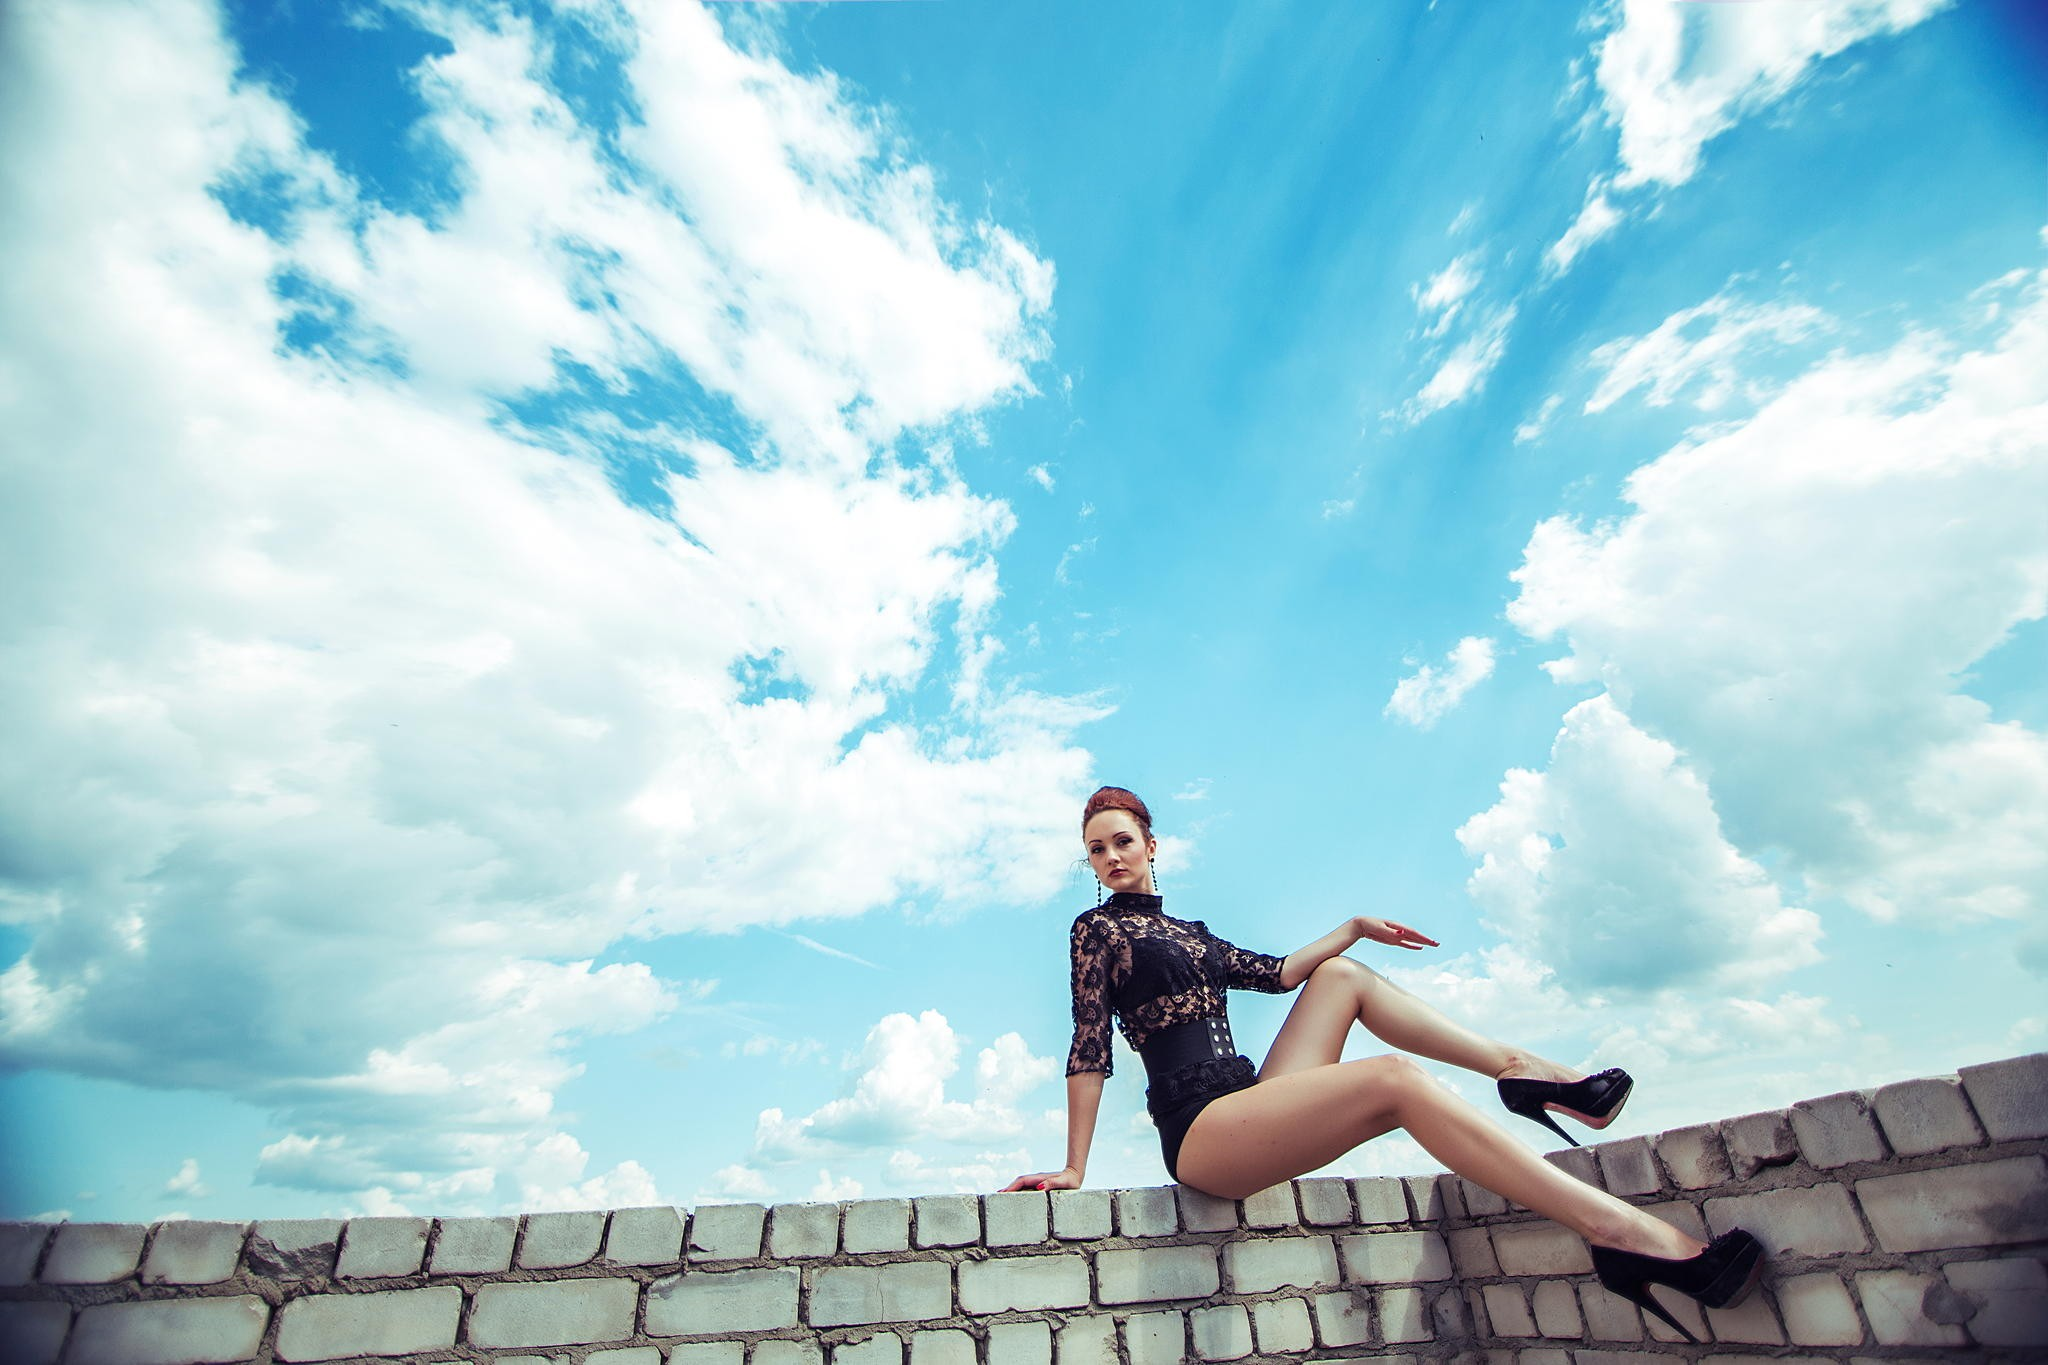 High Heels and Tattoos Wallpapers · K HD Desktop Backgrounds .au